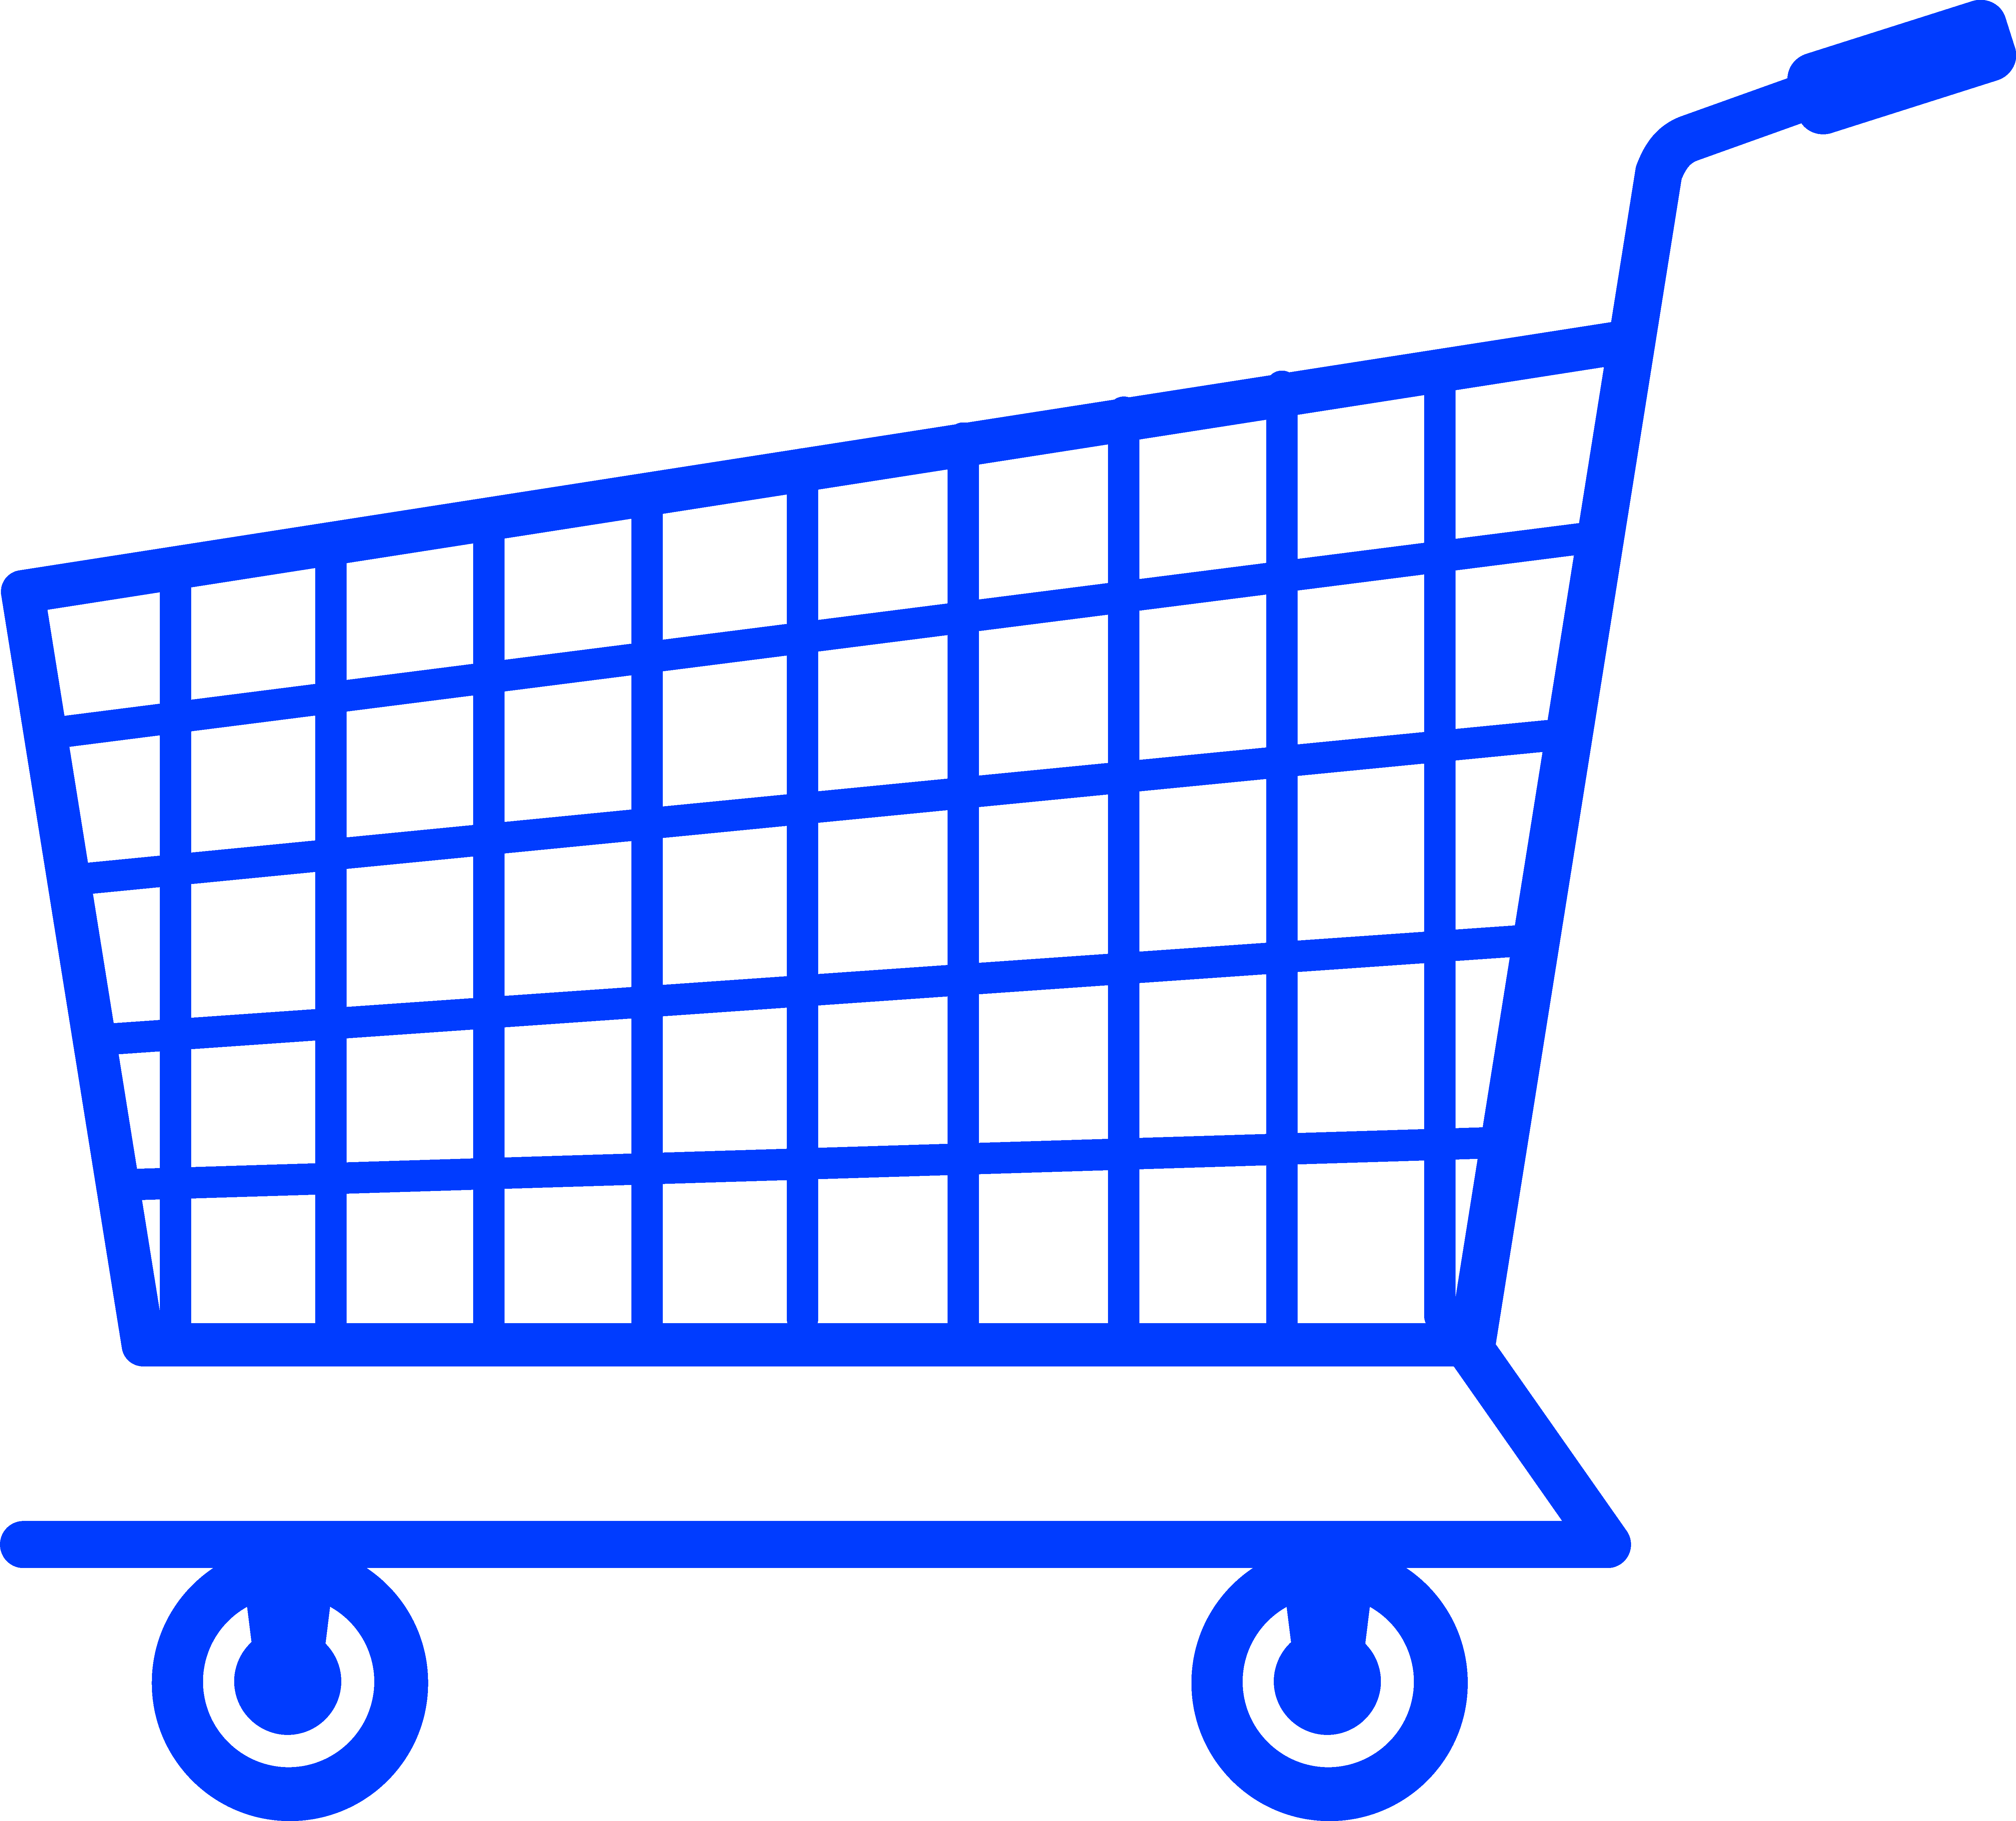 Supermarket Building Clipart | Clipart Panda - Free ...